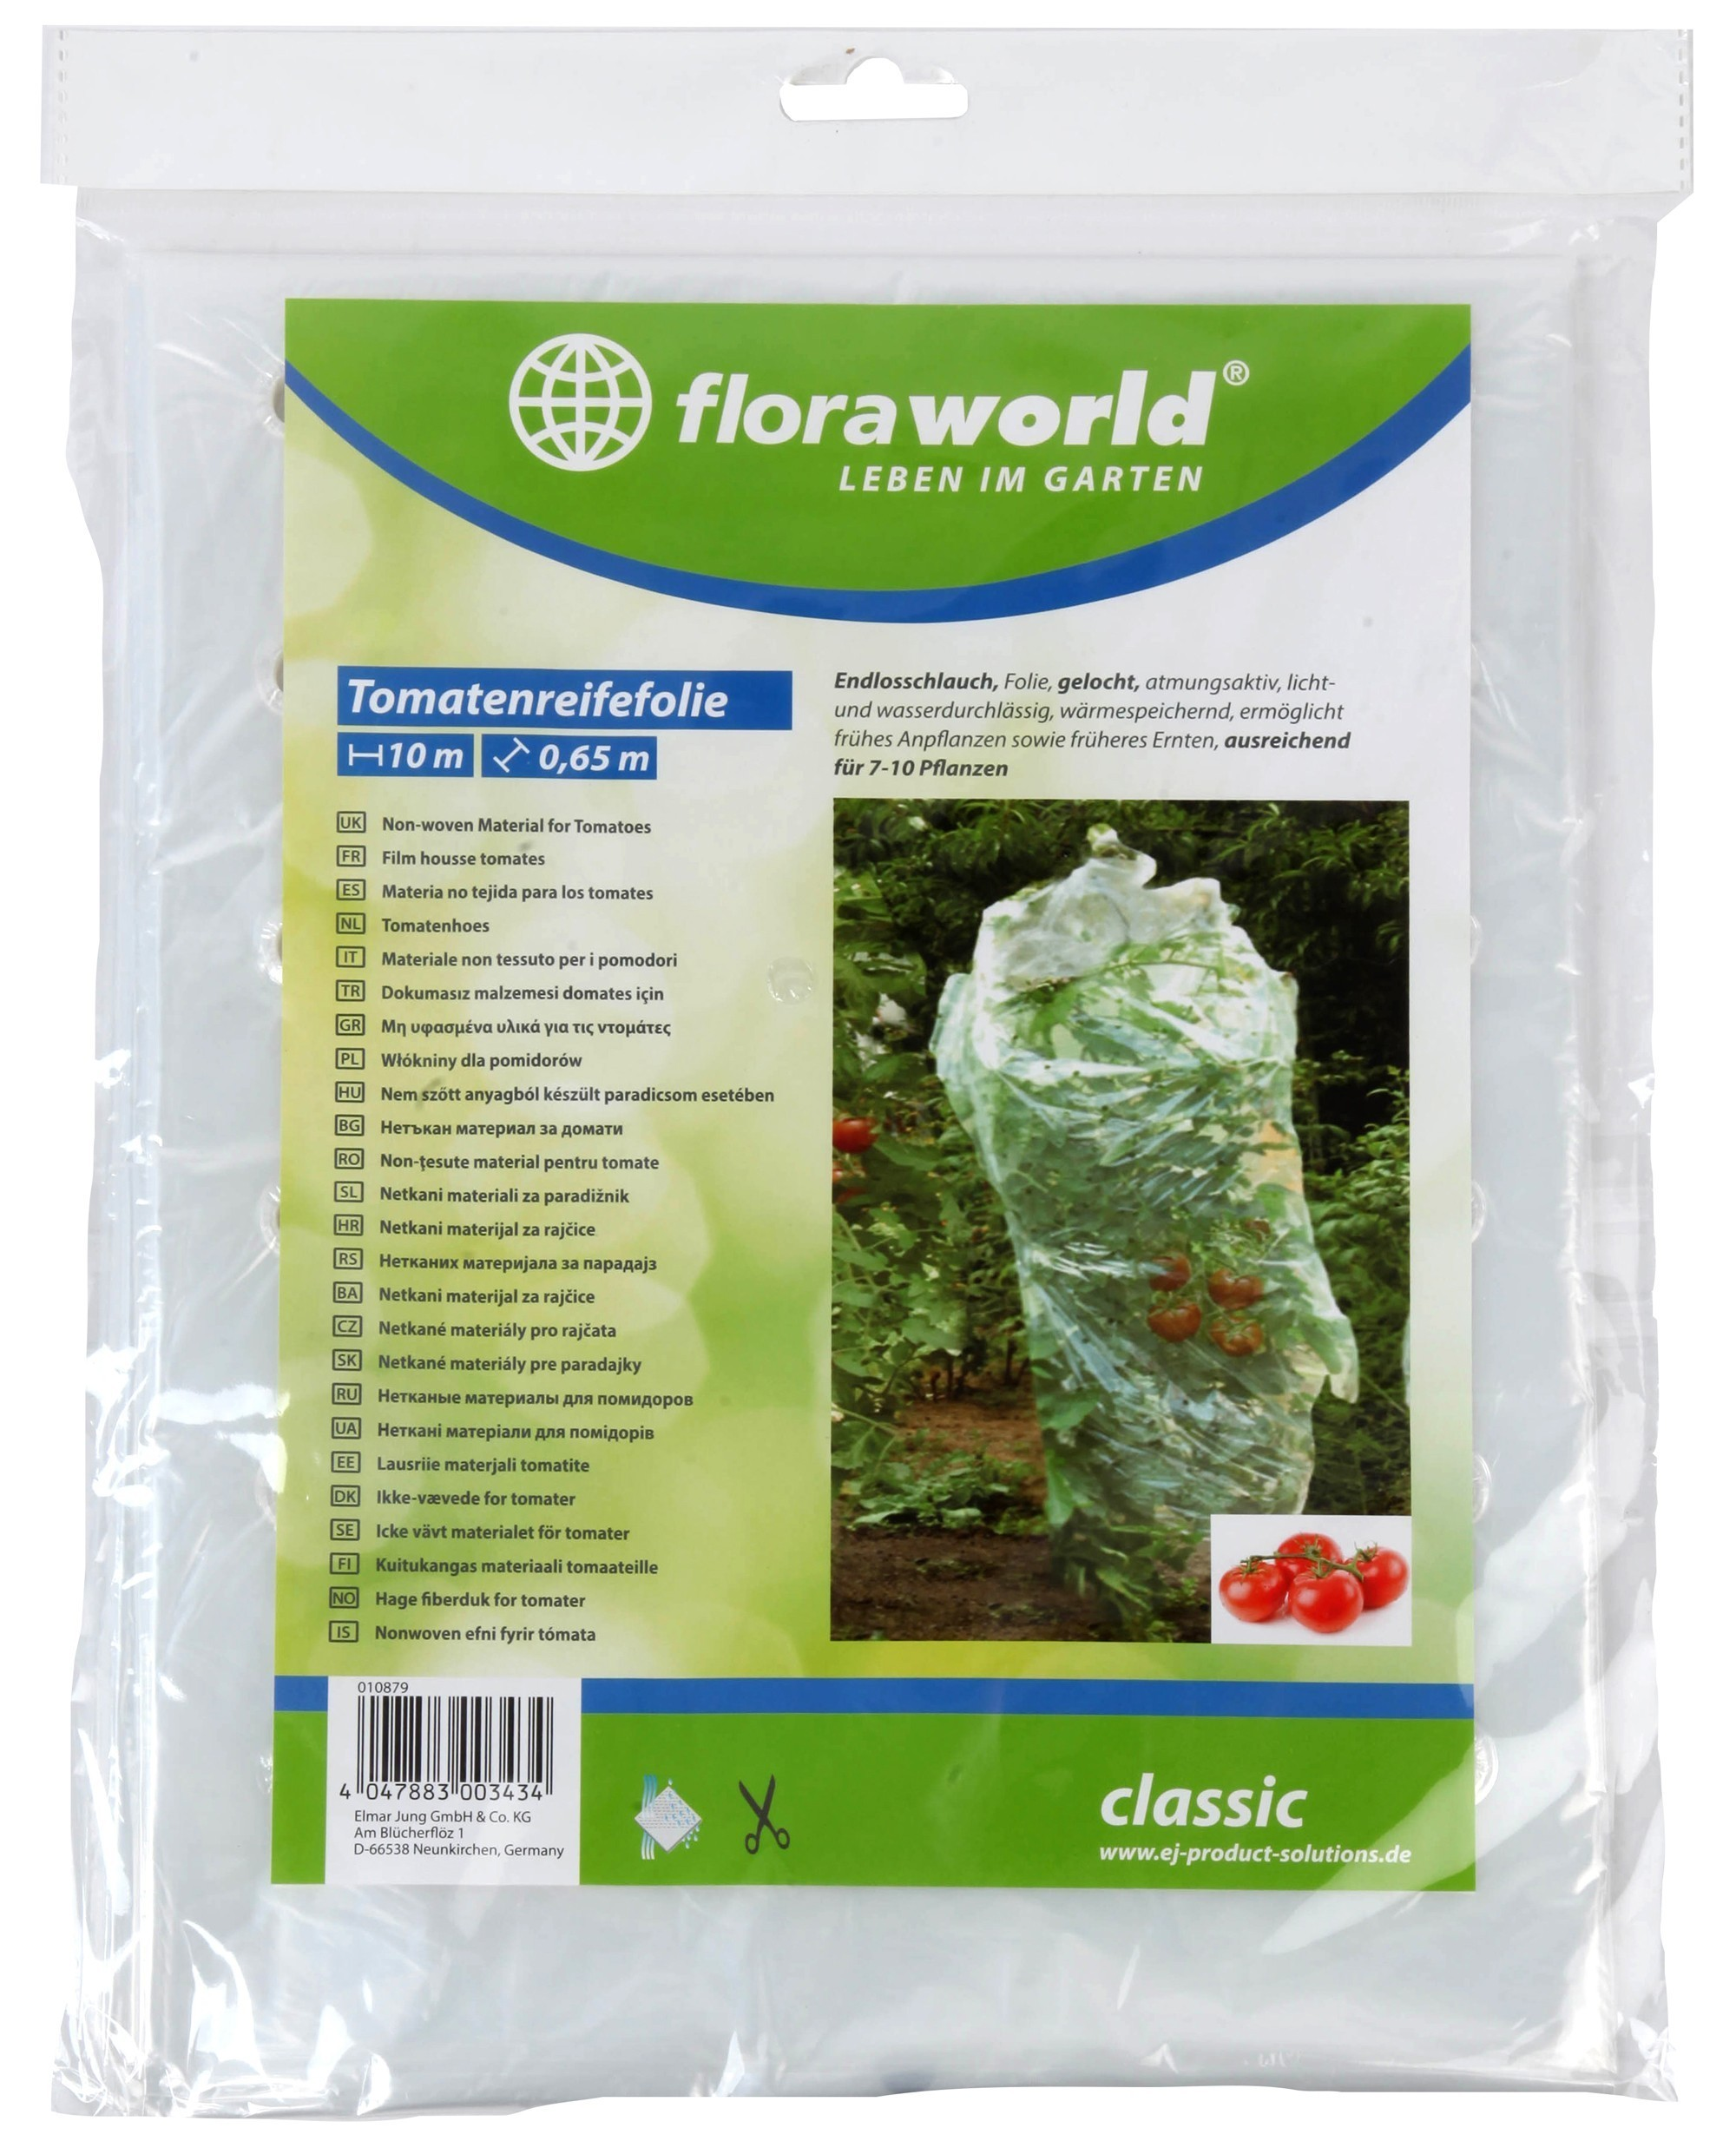 Tomatenreifefolie / Reifefolie classic florworld 10x0,65m klar Bild 1